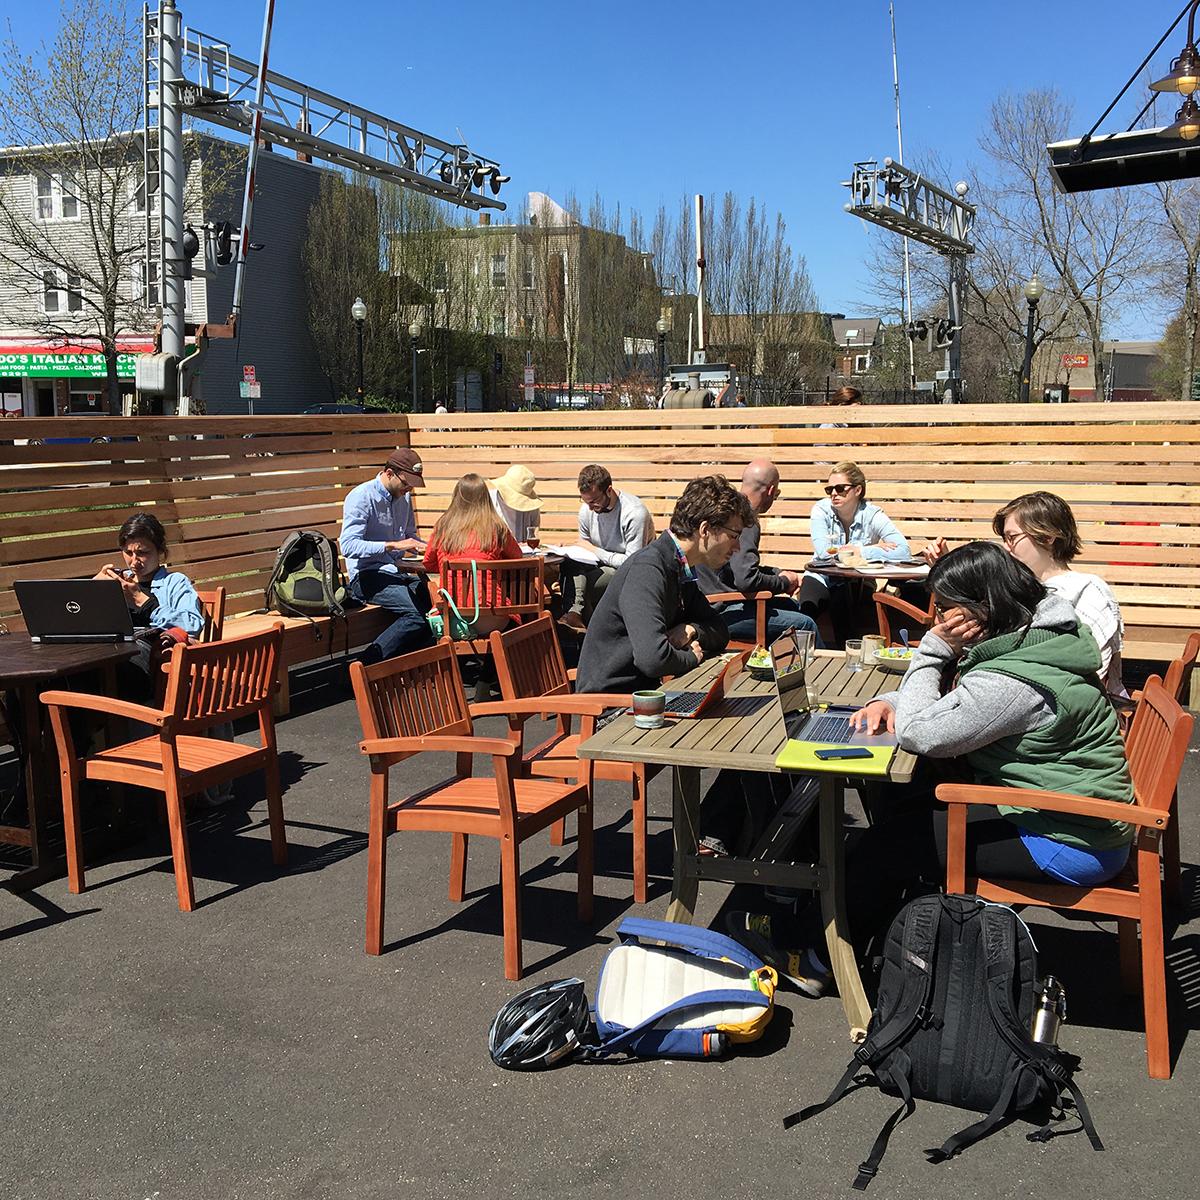 Loyal-Nine-best-outdoor-dining-patio-deck-al-fresco